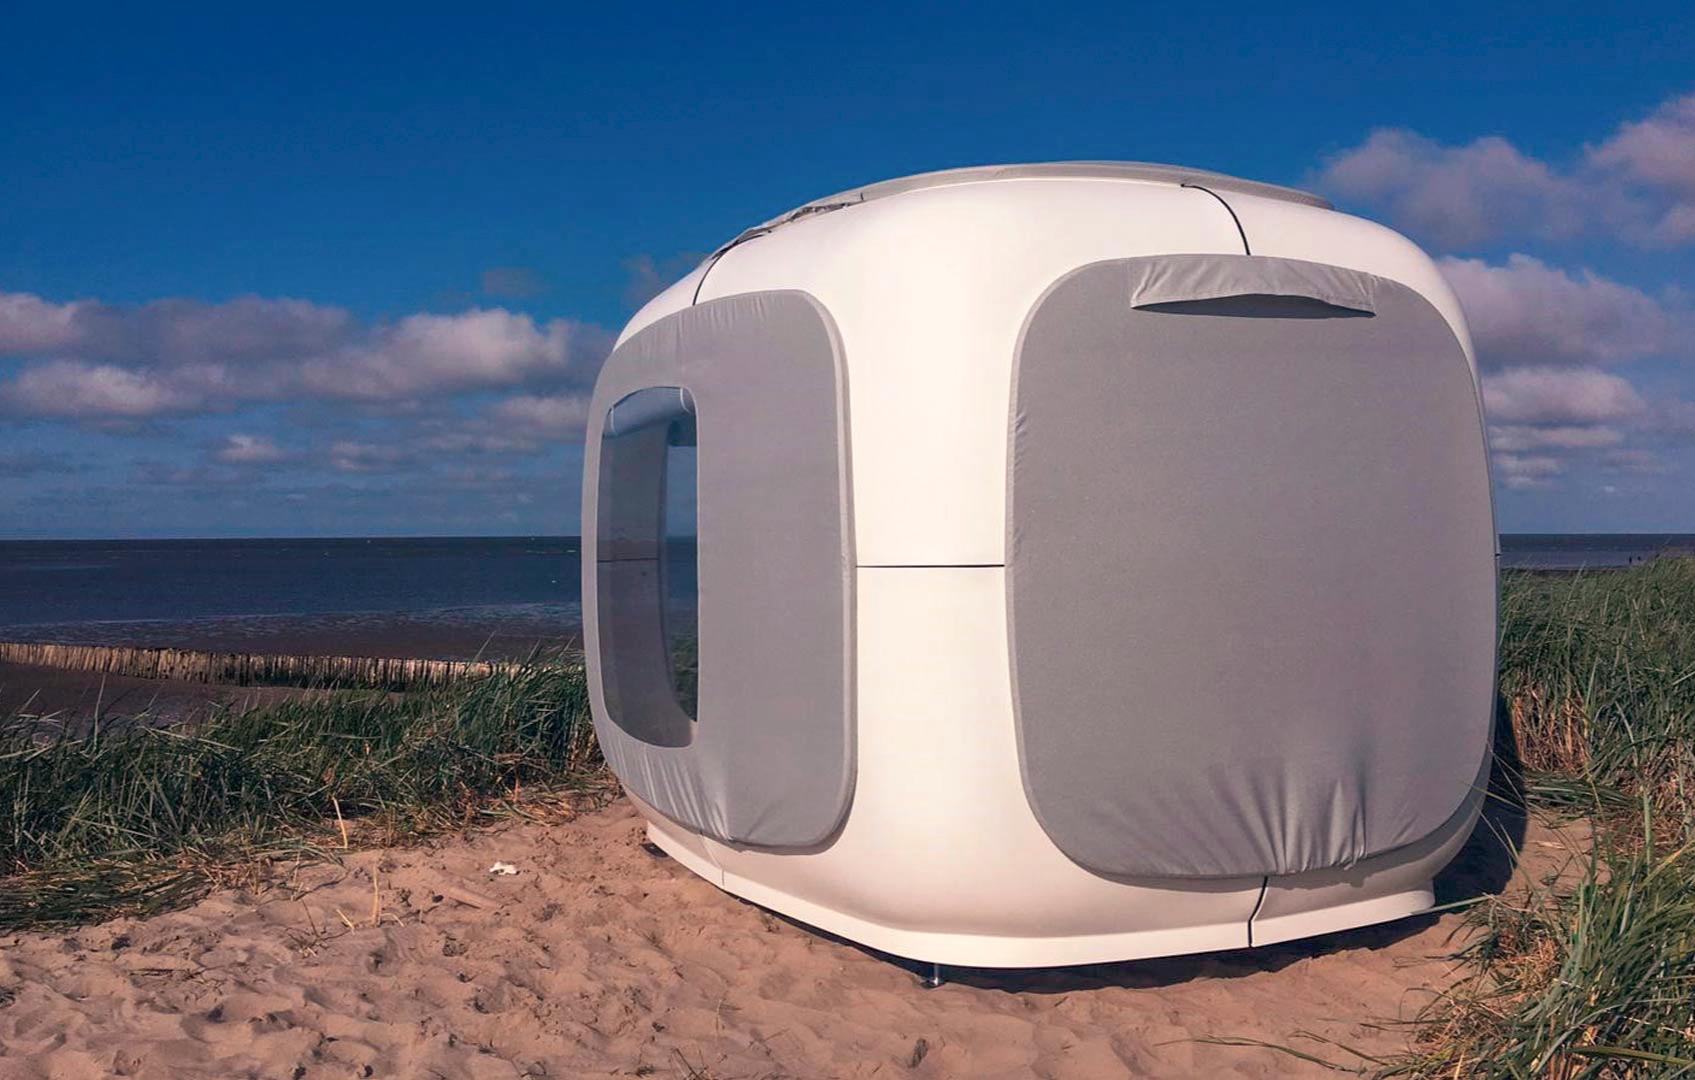 sleeperoo-cube-1-uen-preis-b-mo-do-friesland-cube-ebbe-am-strand-bg2